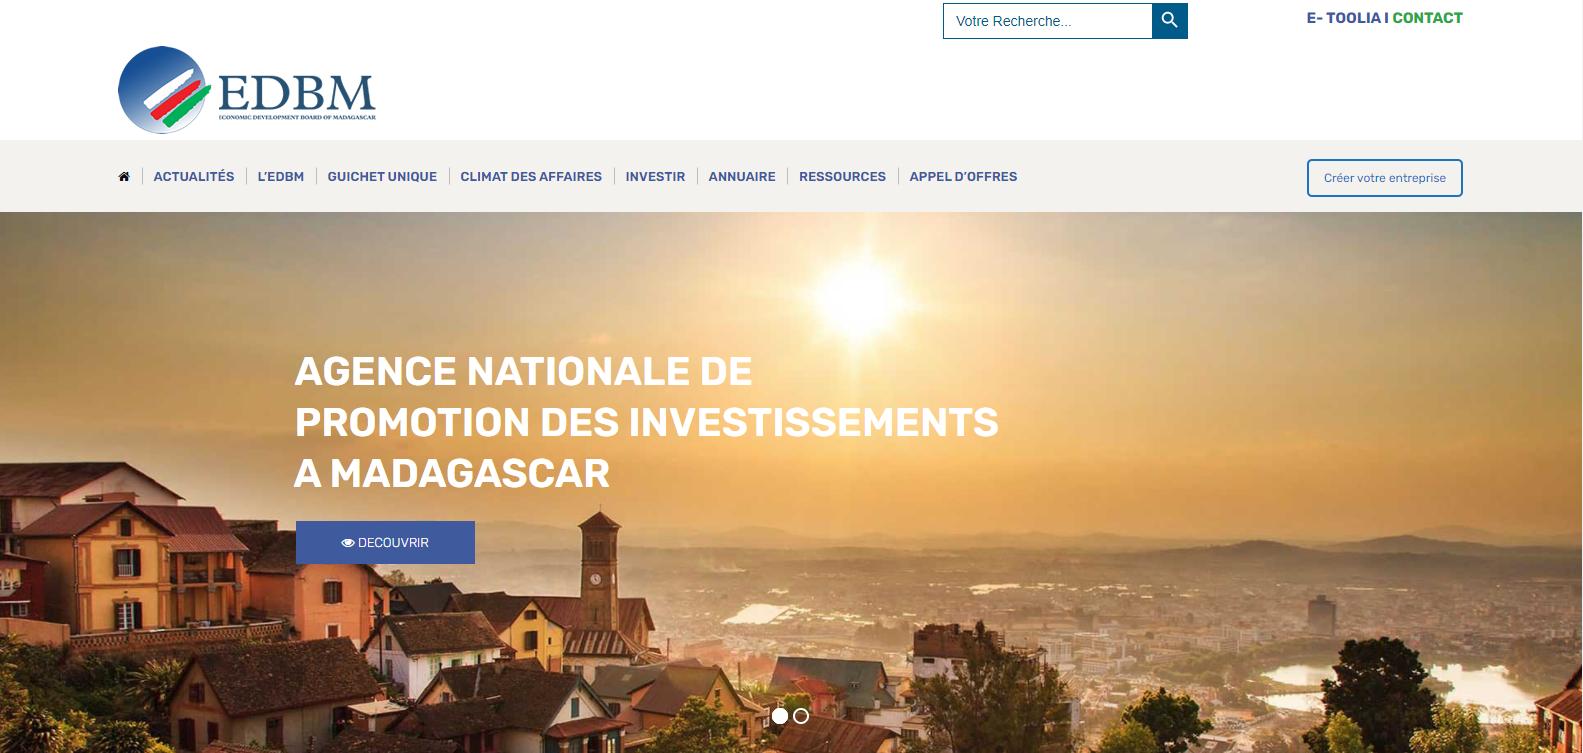 edbm site web agence de promotion madagascar plateforme en ligne